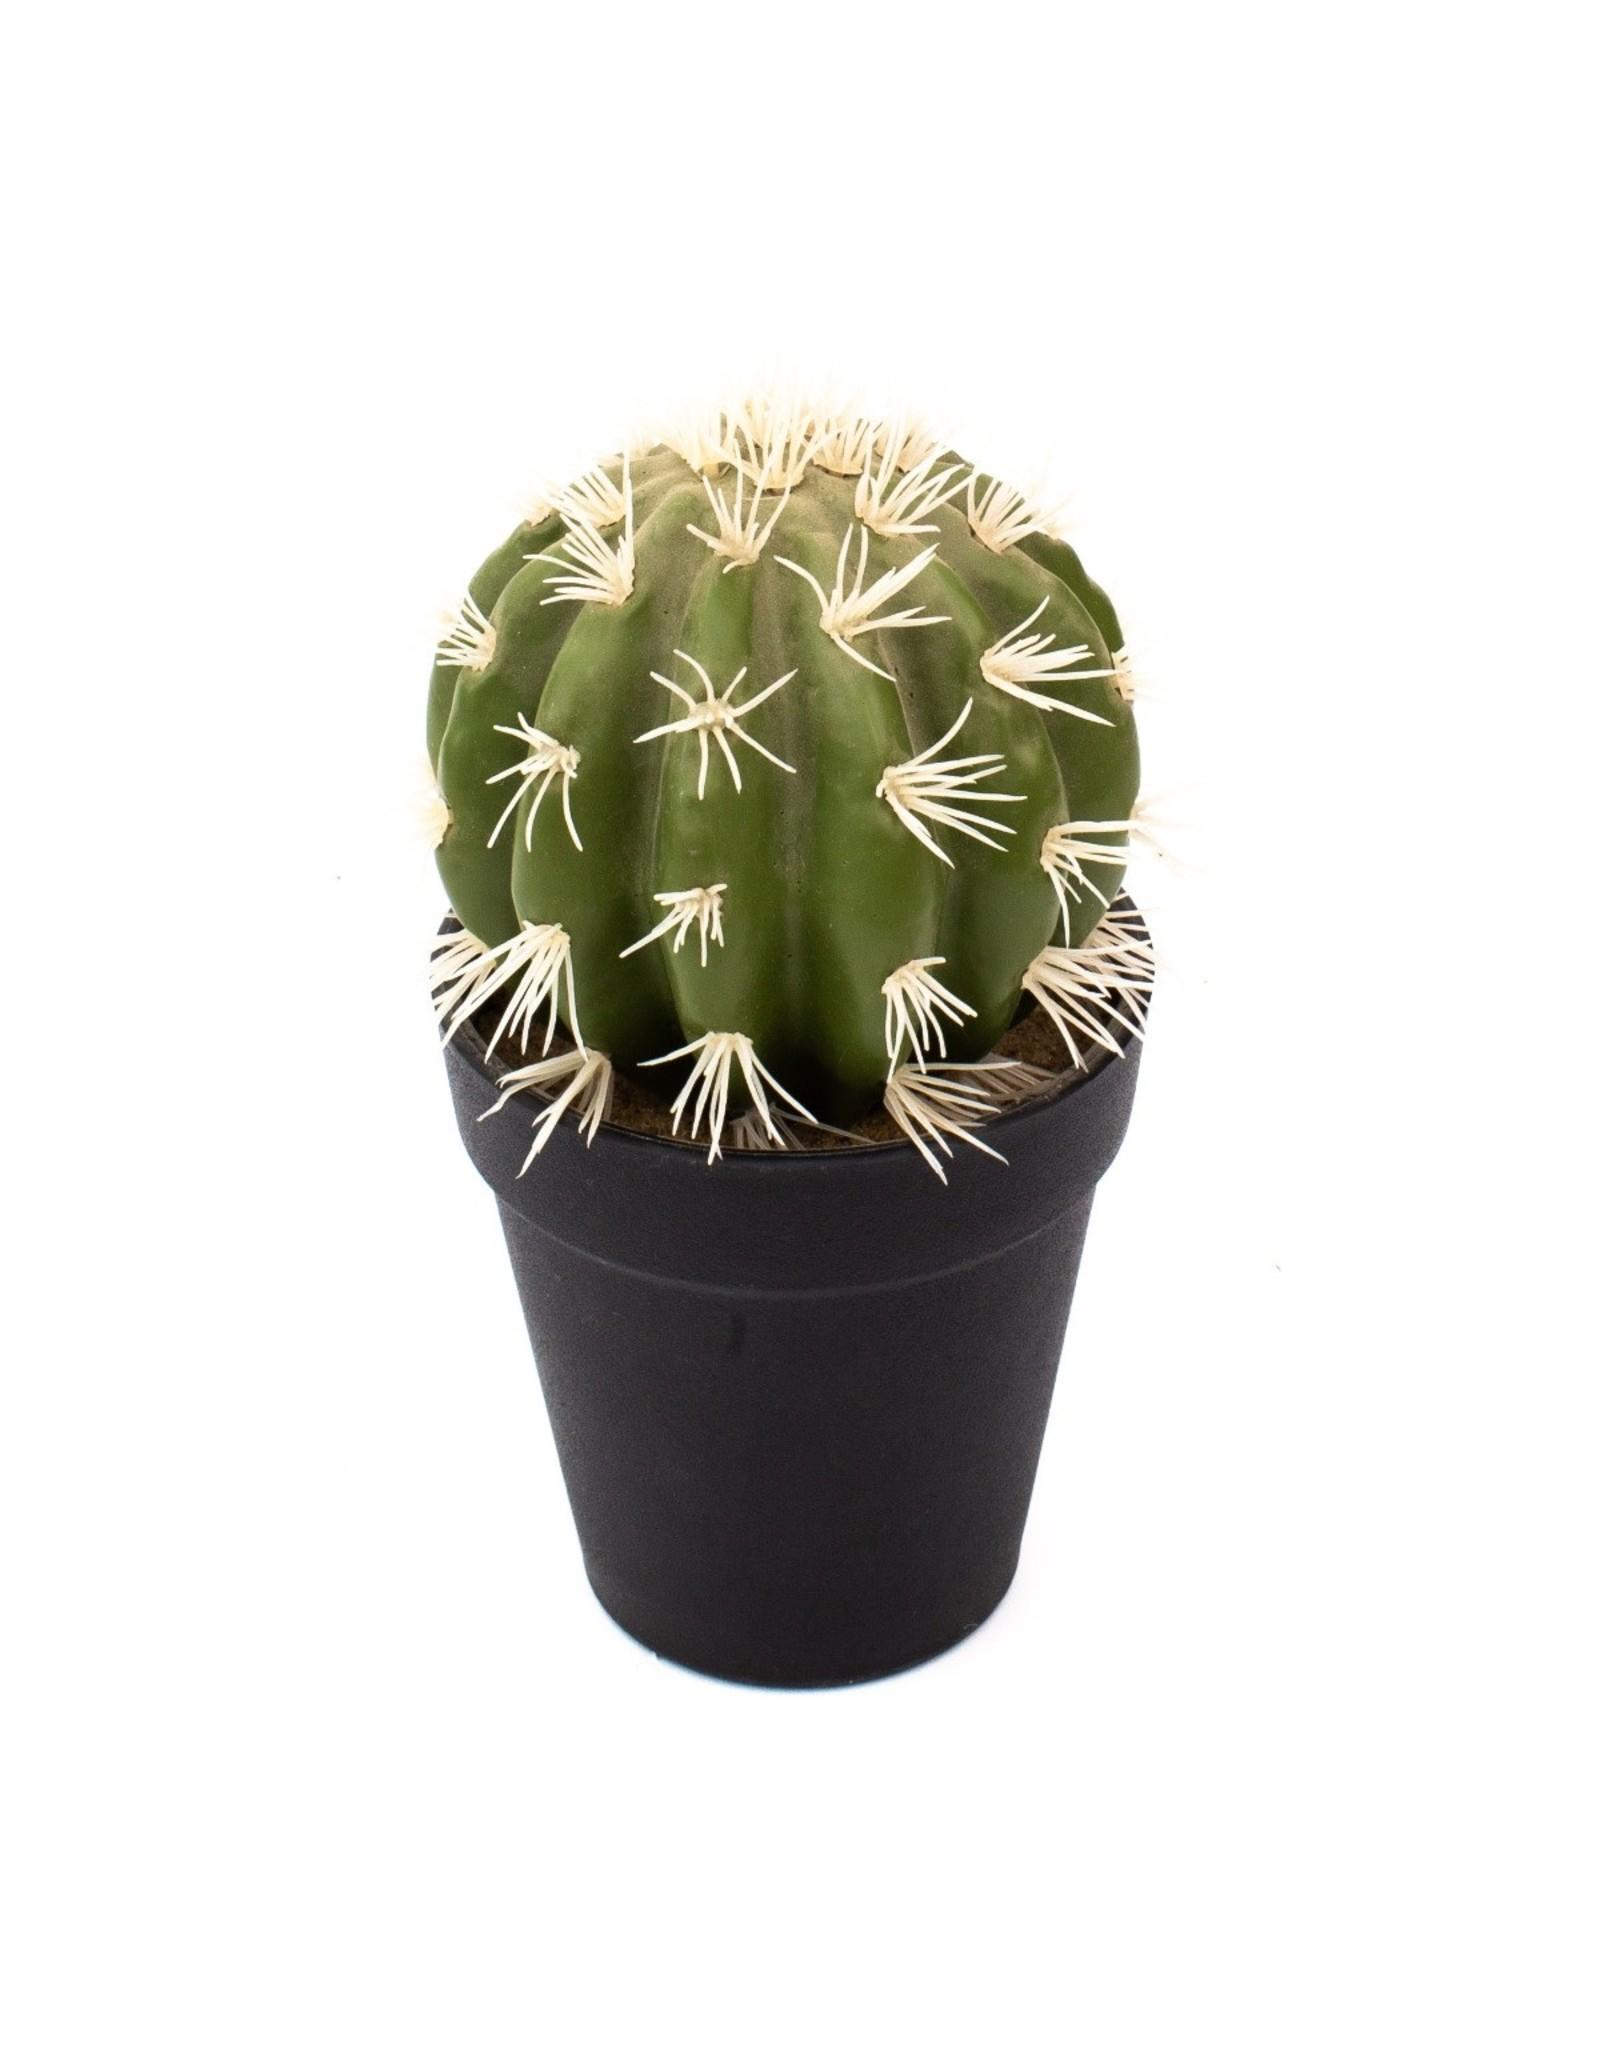 Edelman - Cactus Green Assorted